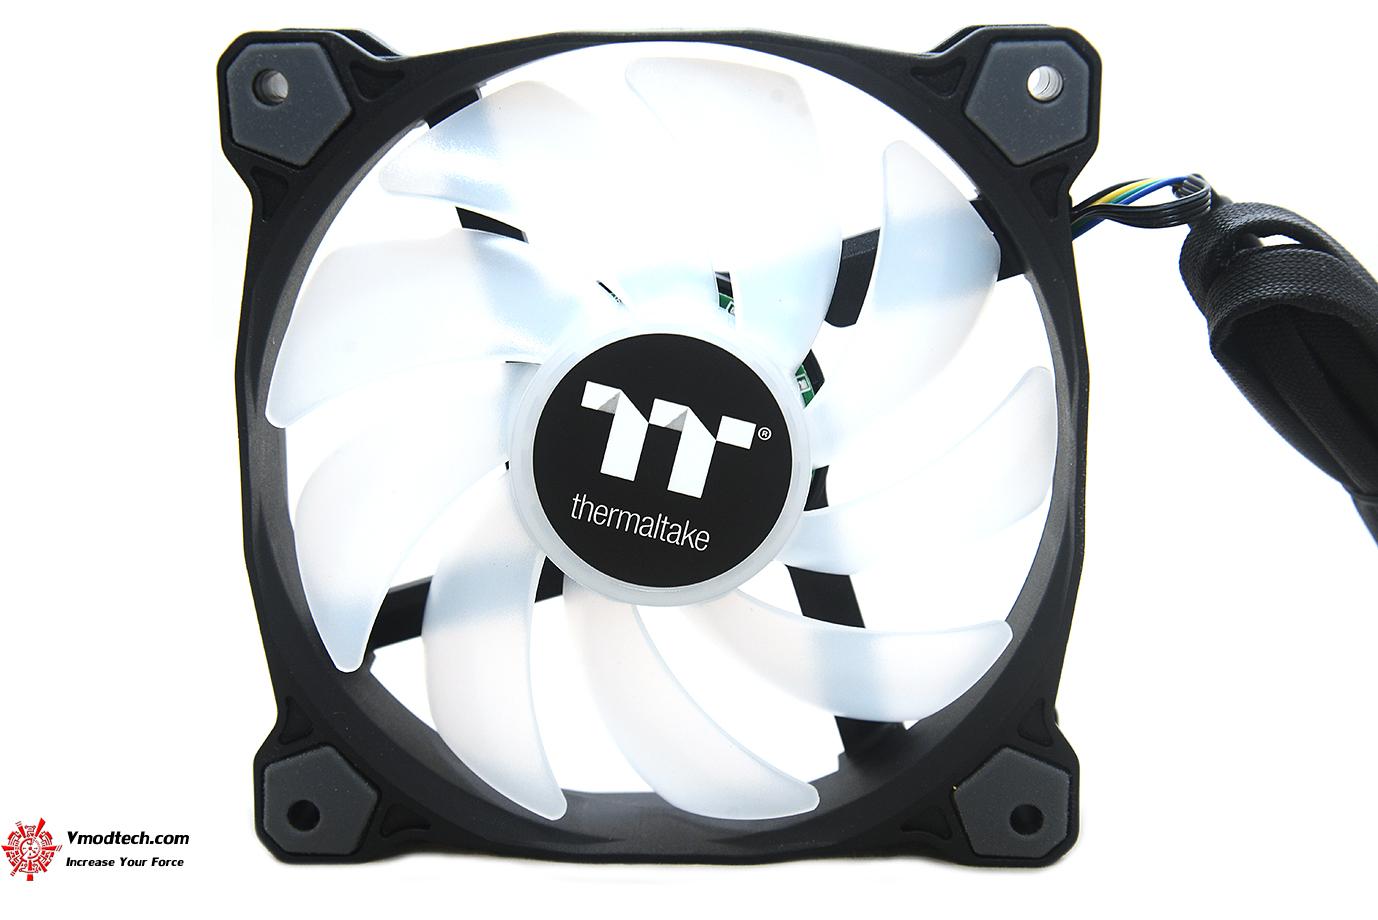 dsc 8852 Thermaltake Pure Plus 12 LED RGB Radiator Fan TT Premium Edition (3 Fan Pack) Review